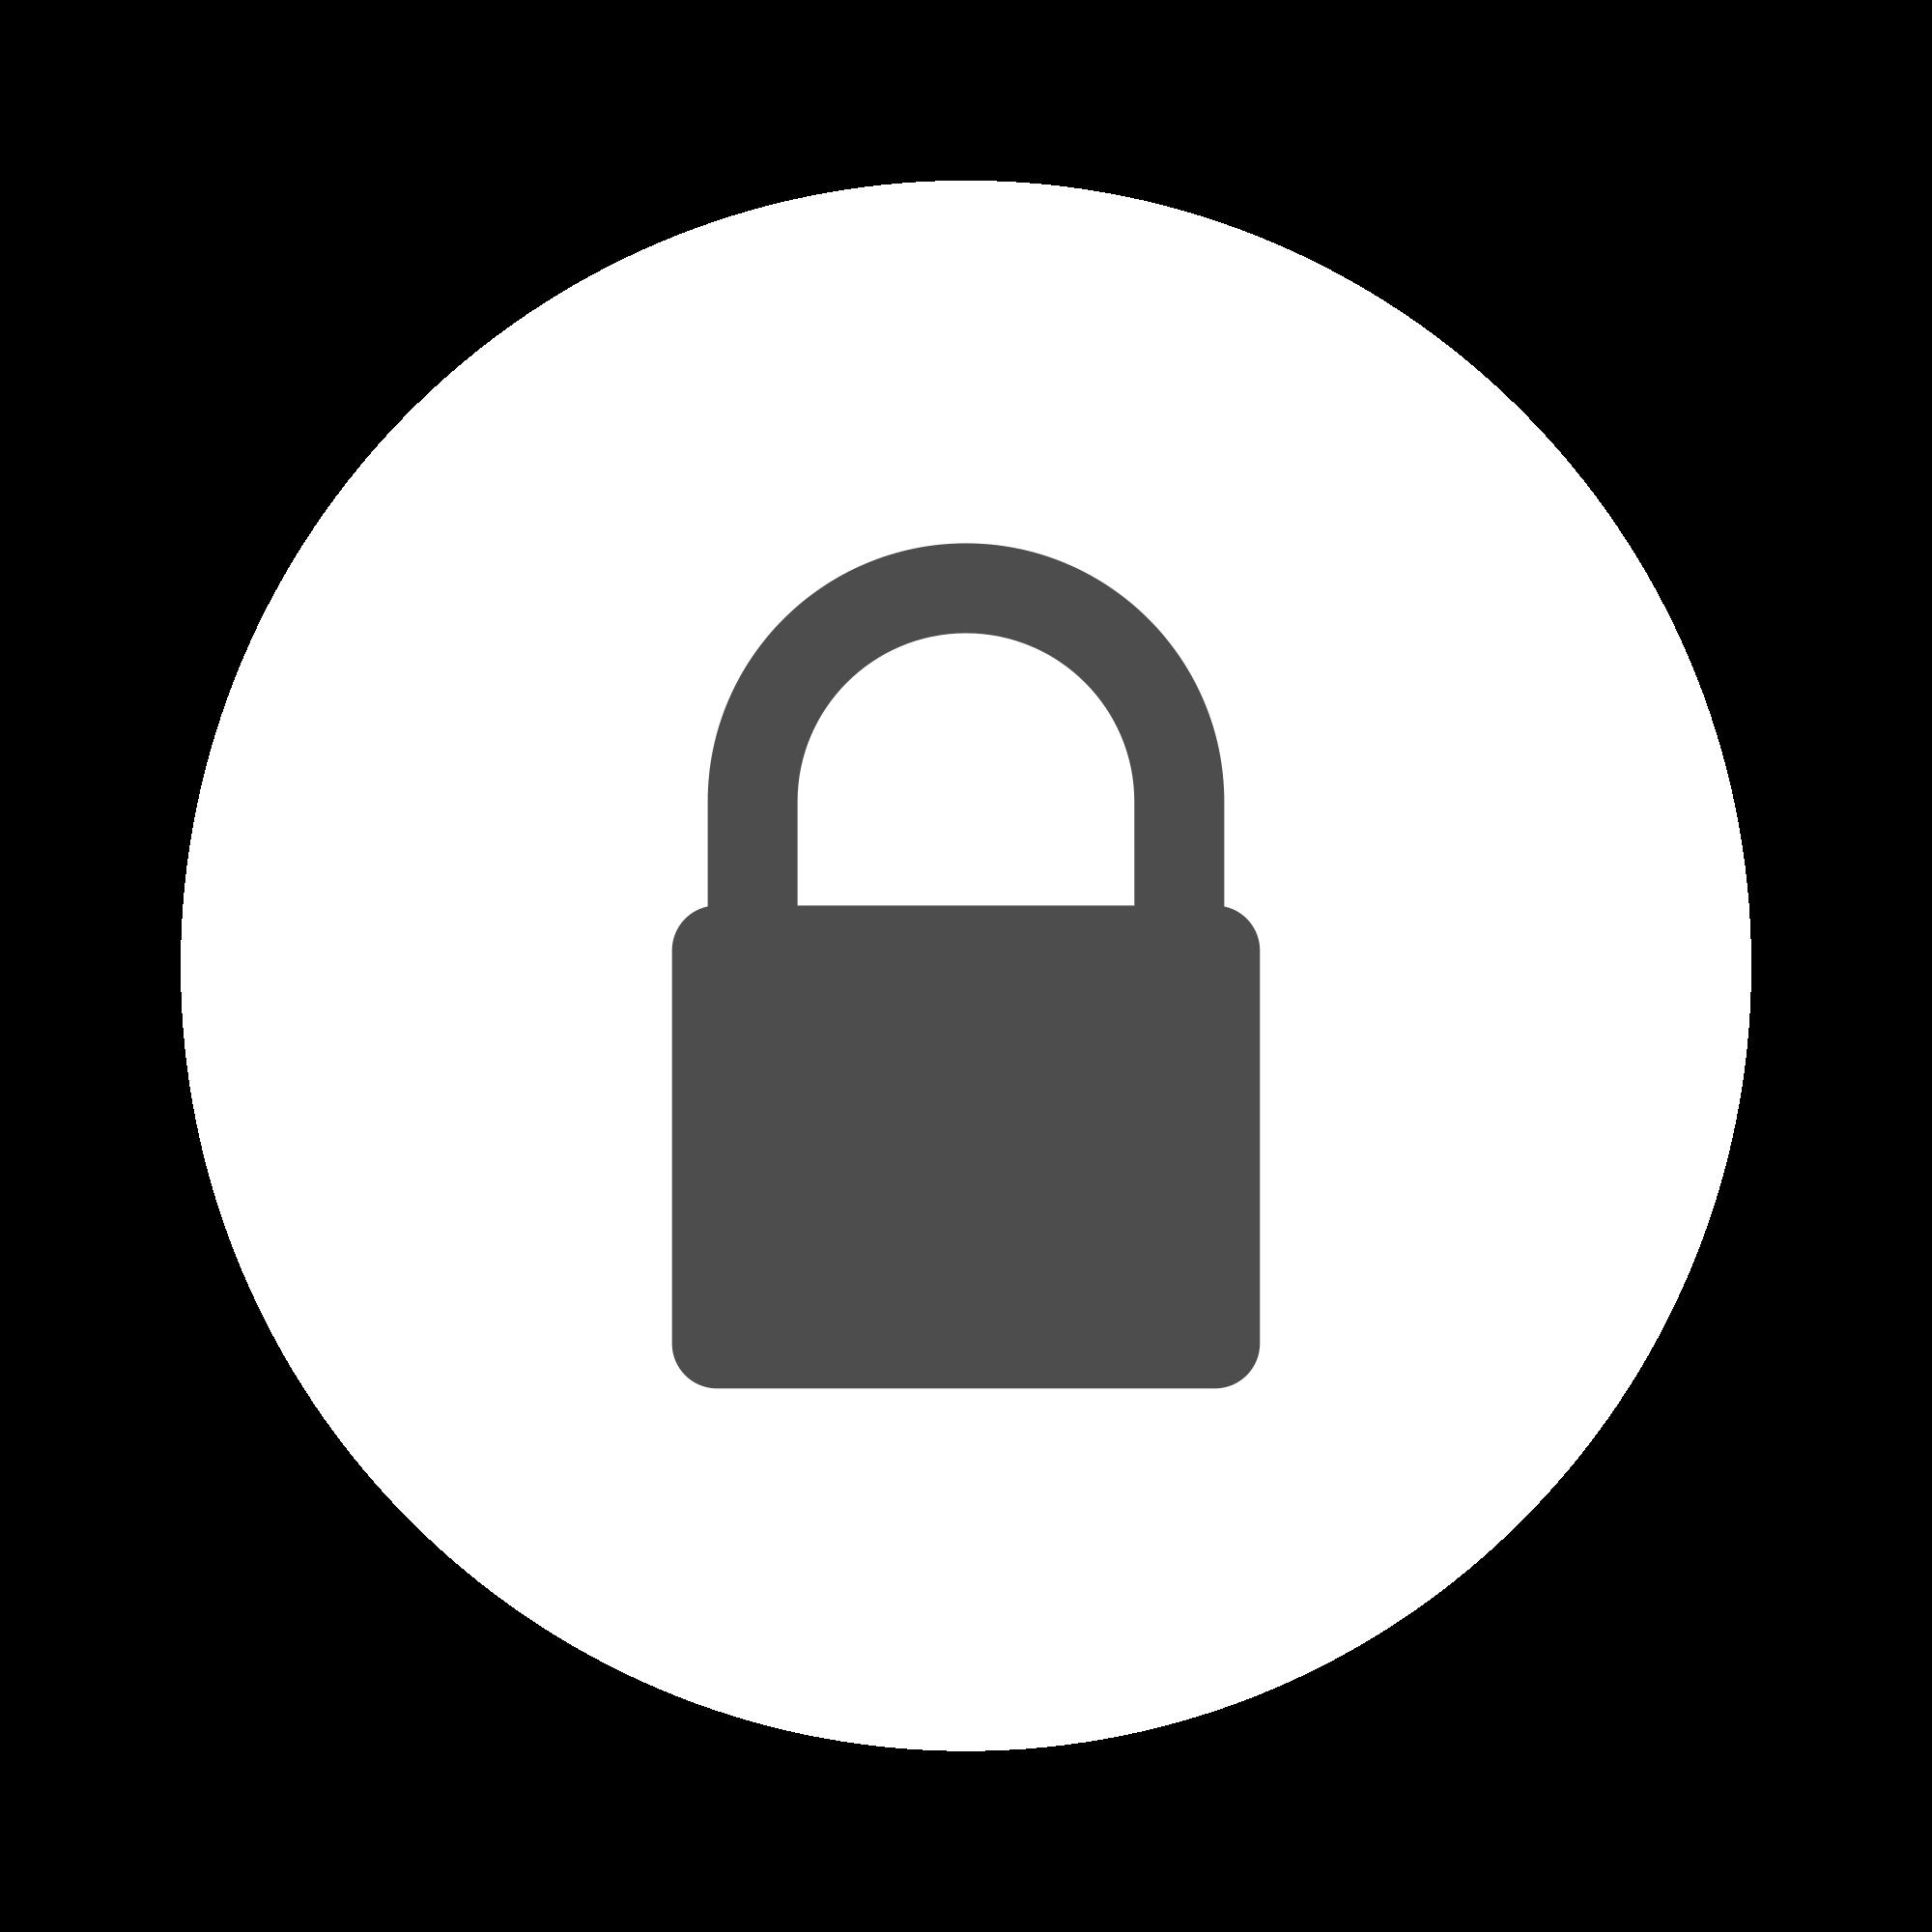 File:Antu object-locked.svg - Wikimedia Commons